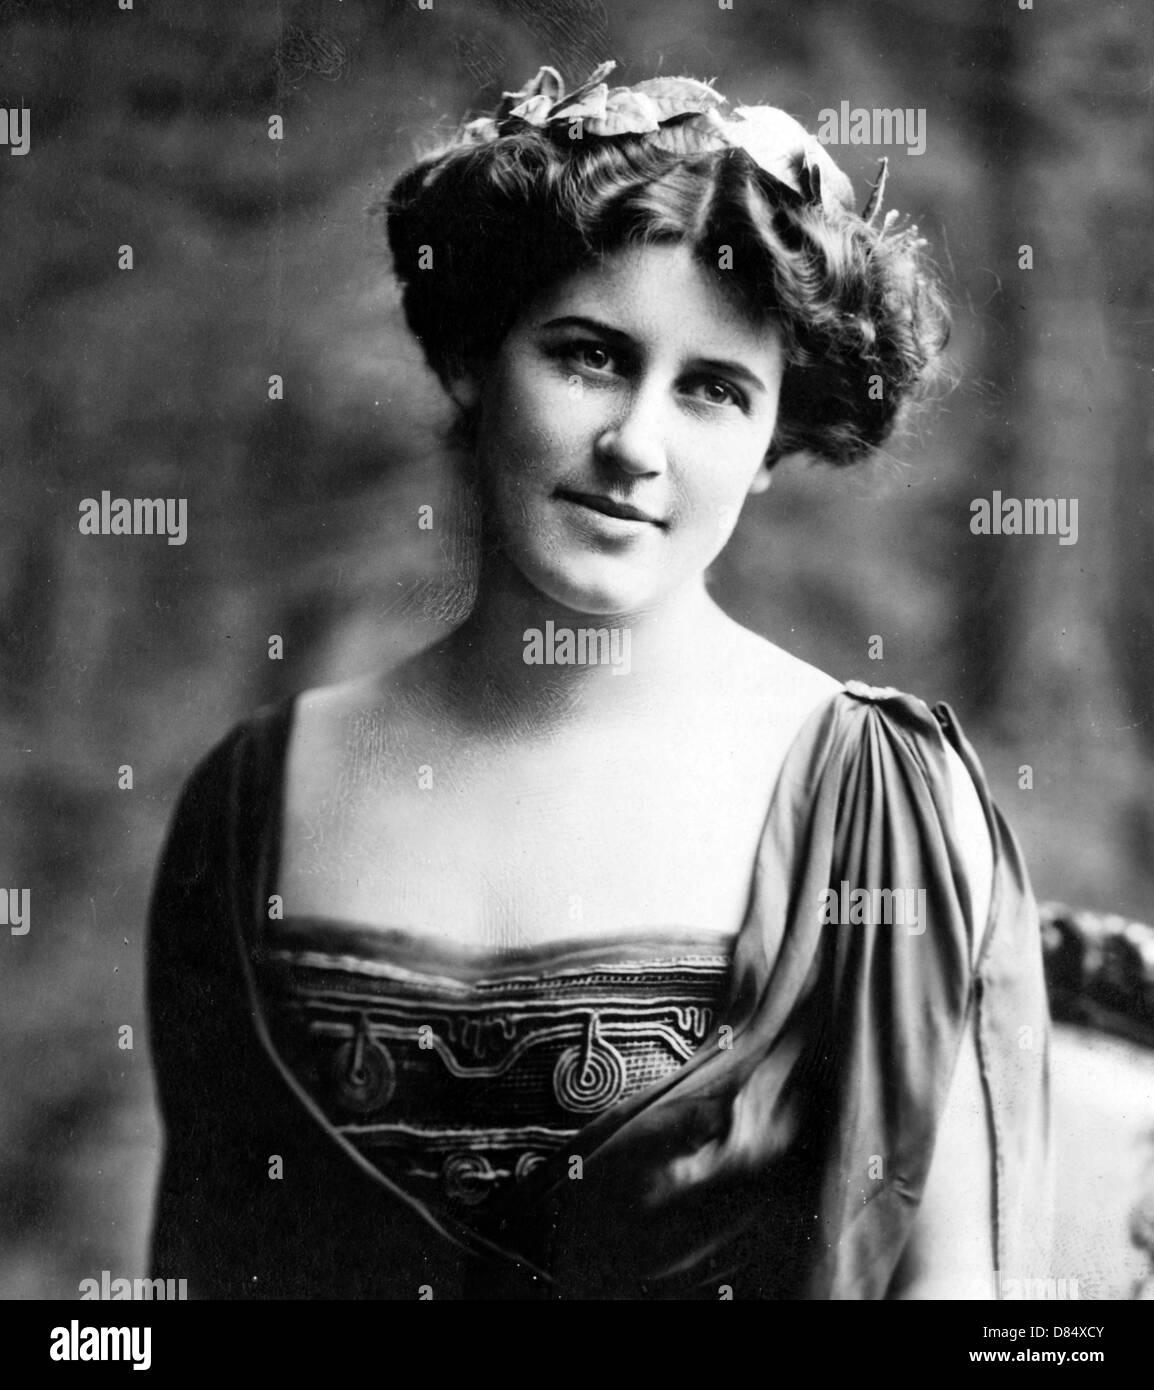 Suffragette Inez Milholland Boissevain Immagini Stock